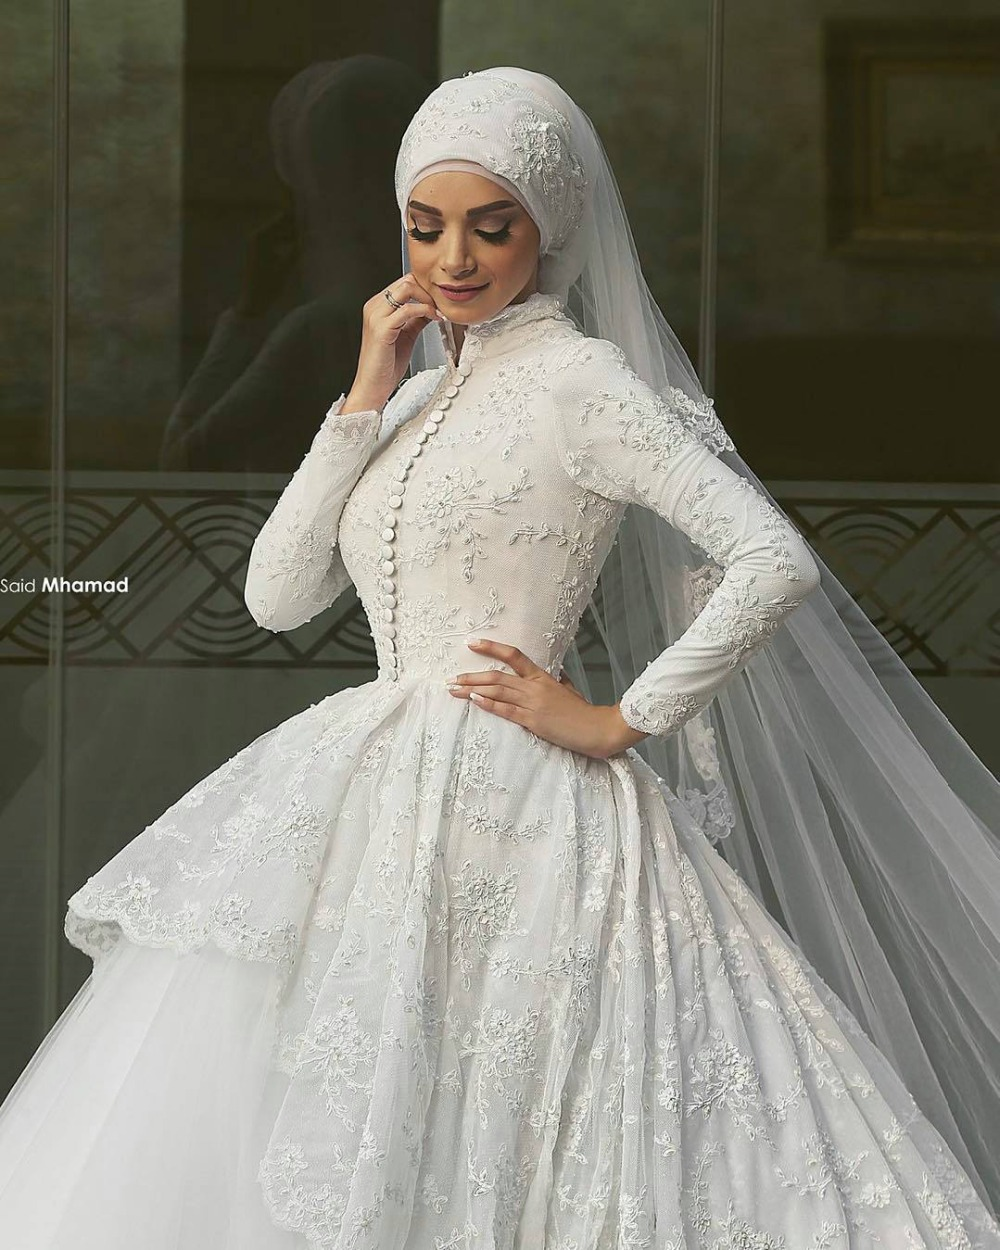 muslim wedding dresses White Lace Long Sleeve Muslim Wedding Dress Mermaid High Neck Bridal Gown Arabic